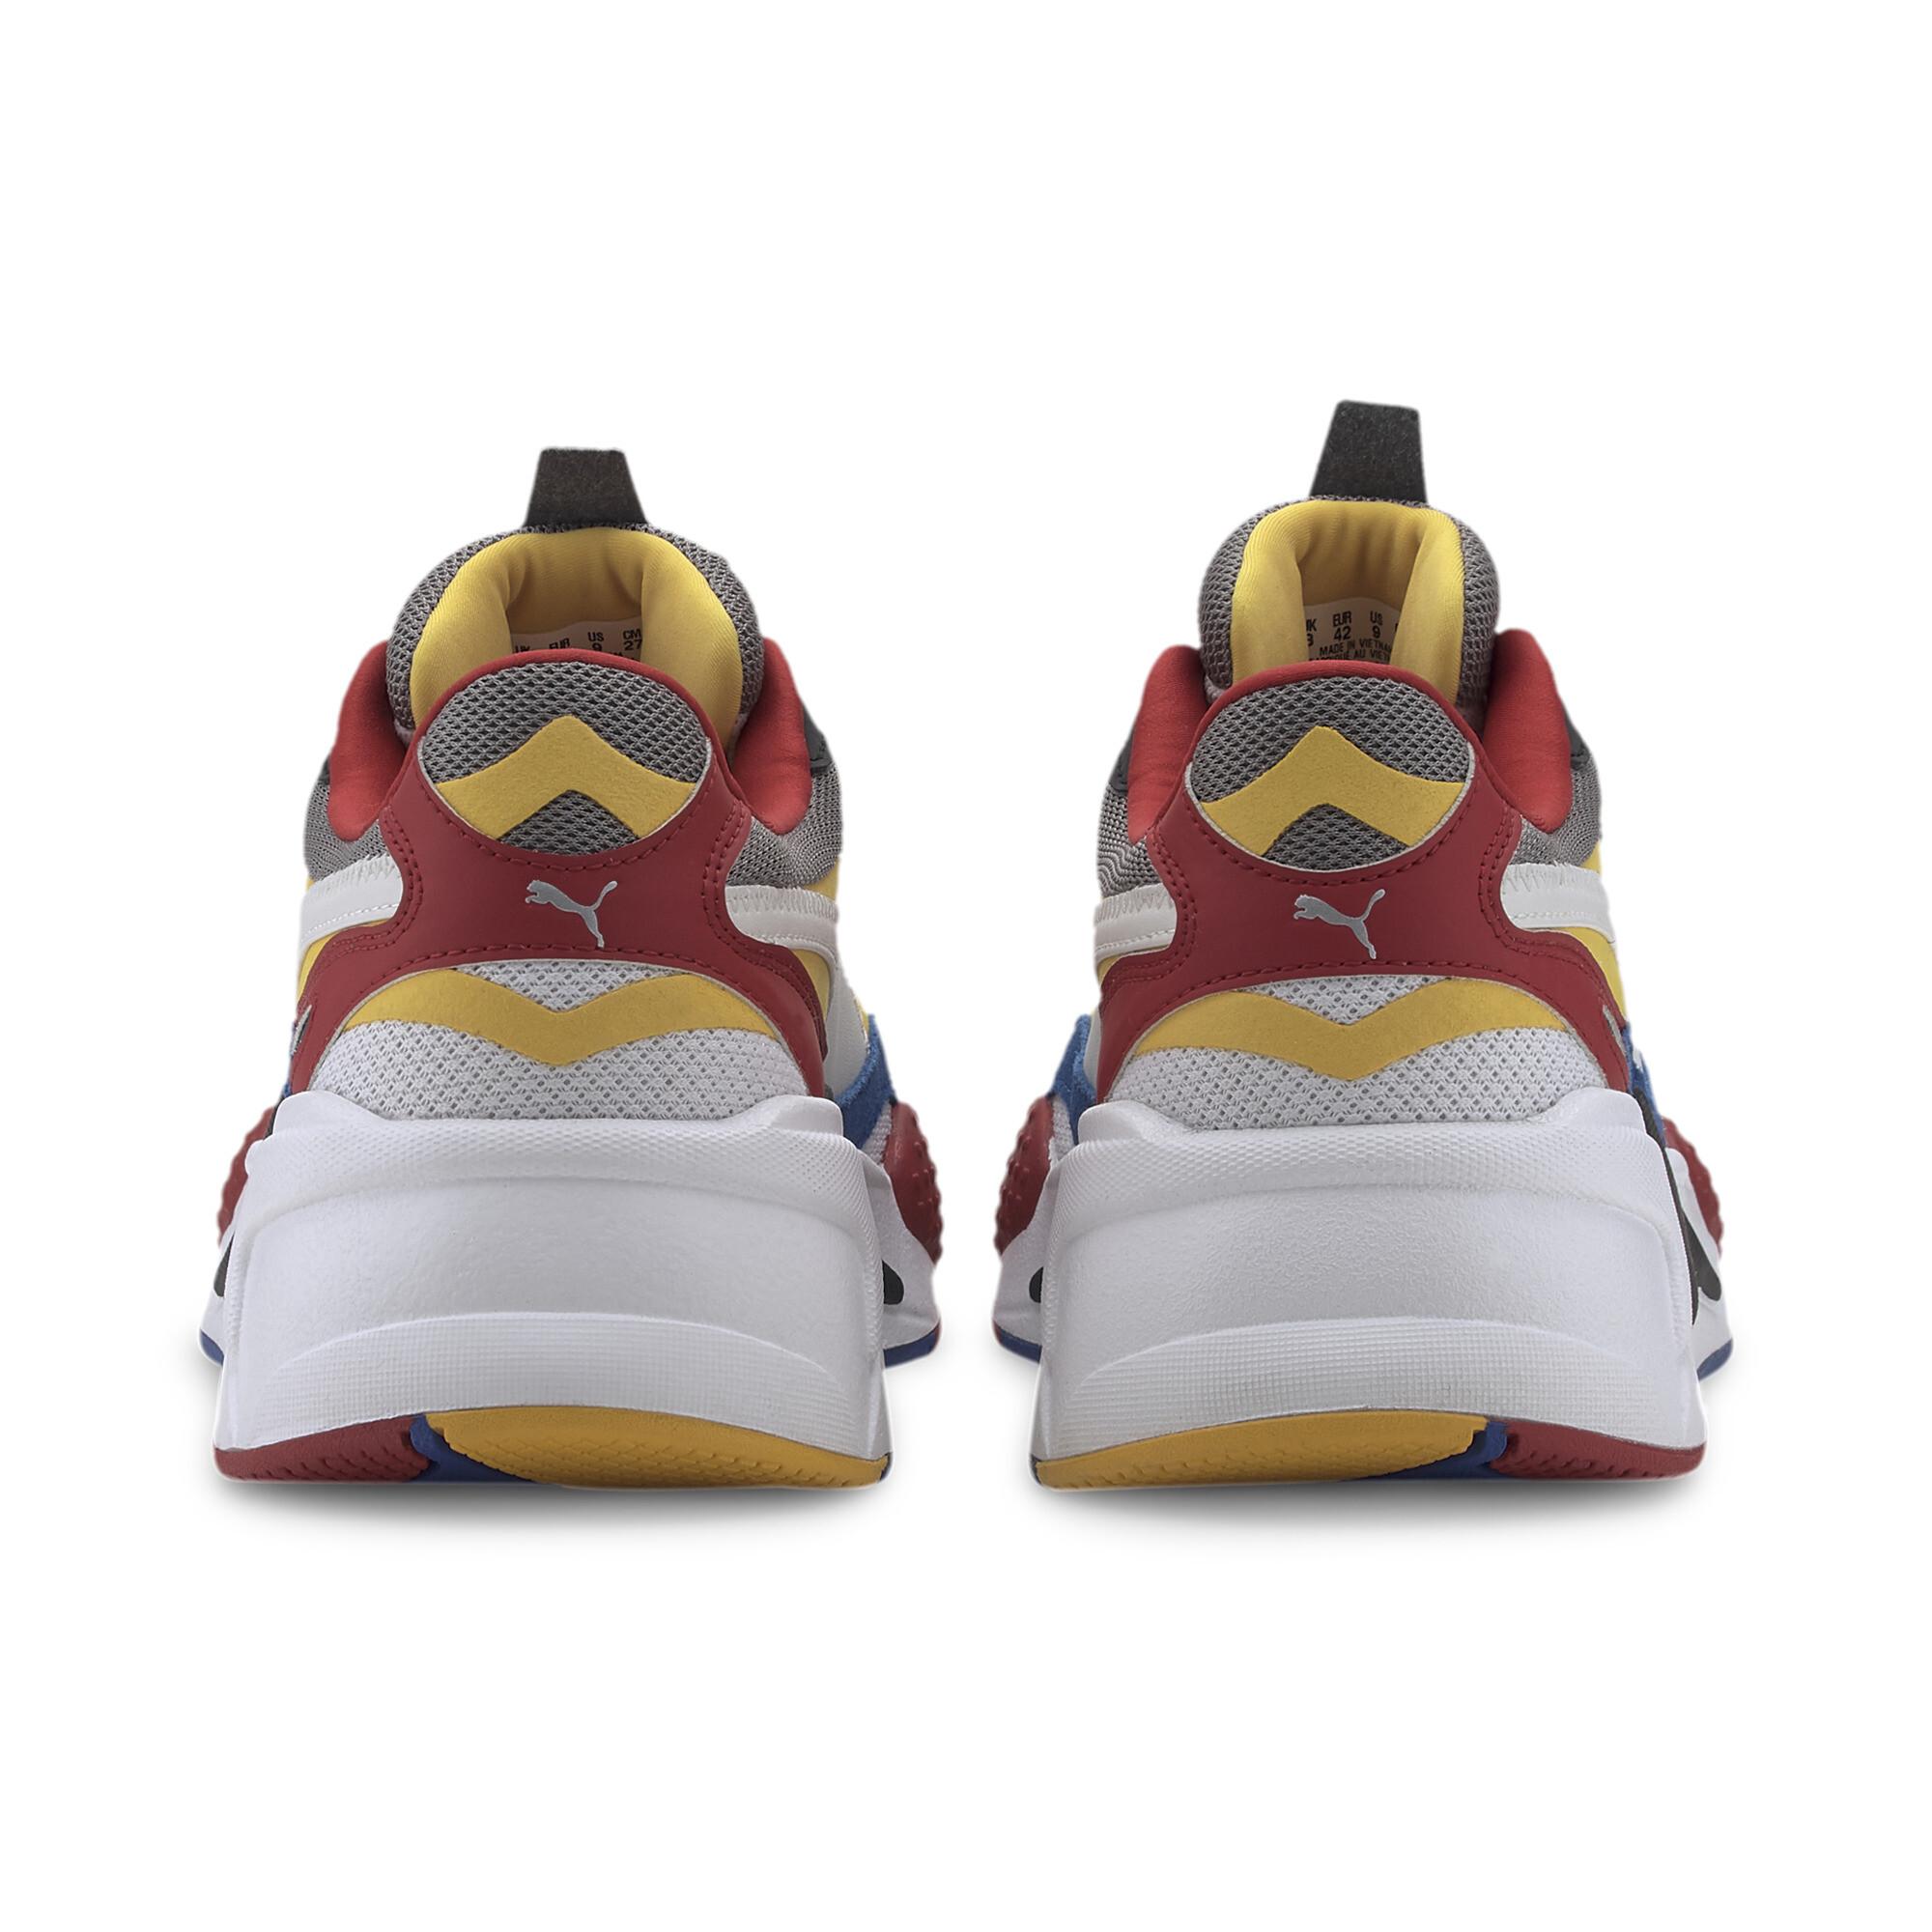 PUMA-Men-039-s-RS-X-Puzzle-Sneakers thumbnail 29